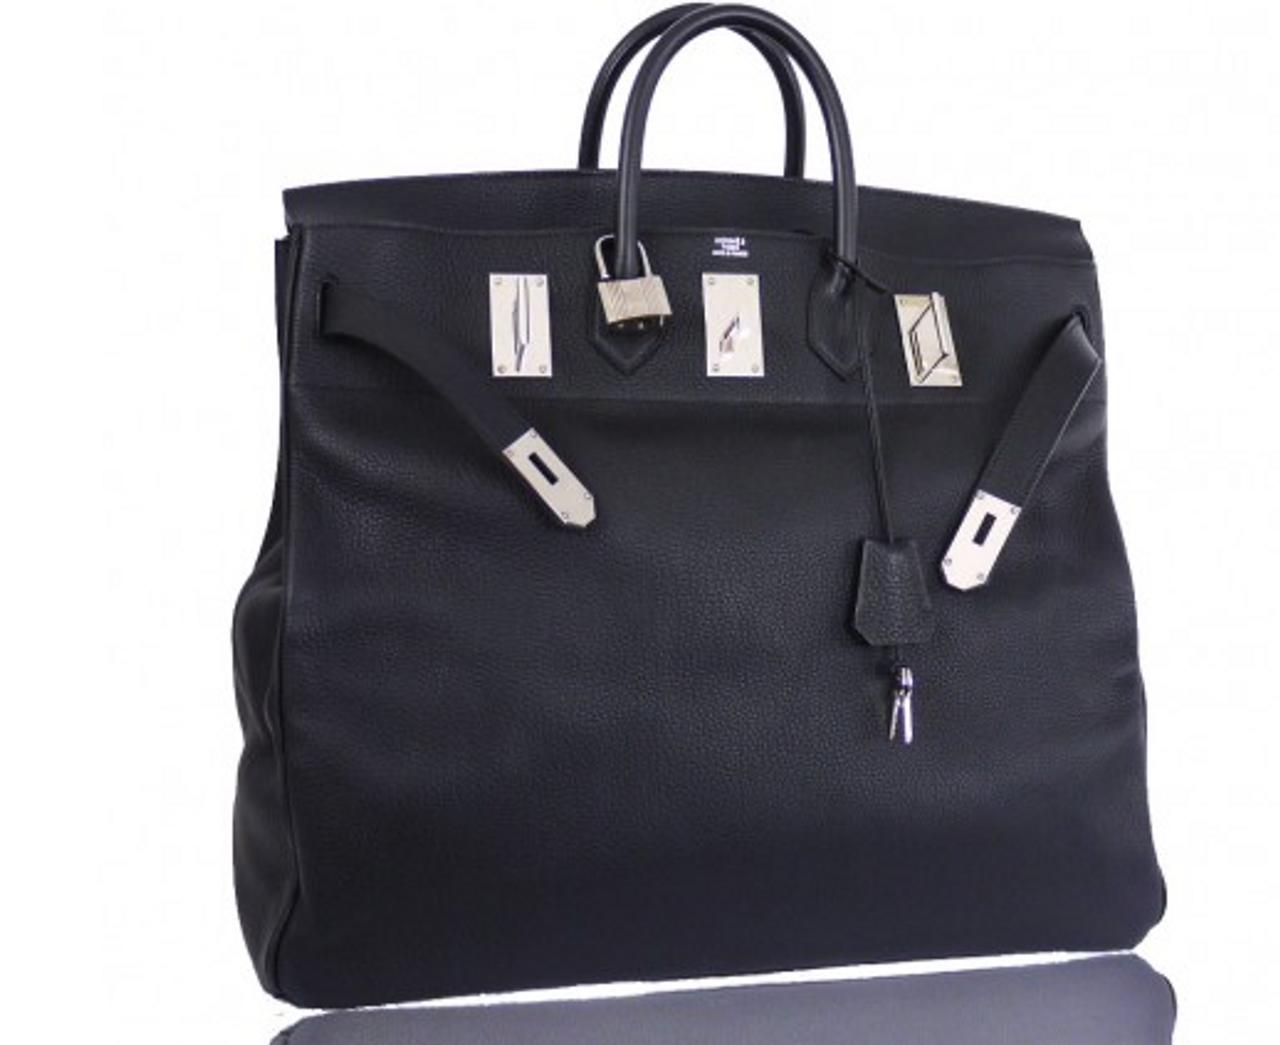 6f830077cc9c Hermes Black Taurillon Clemence 50cm Hac Birkin Bag 50 - Bella Vita Moda